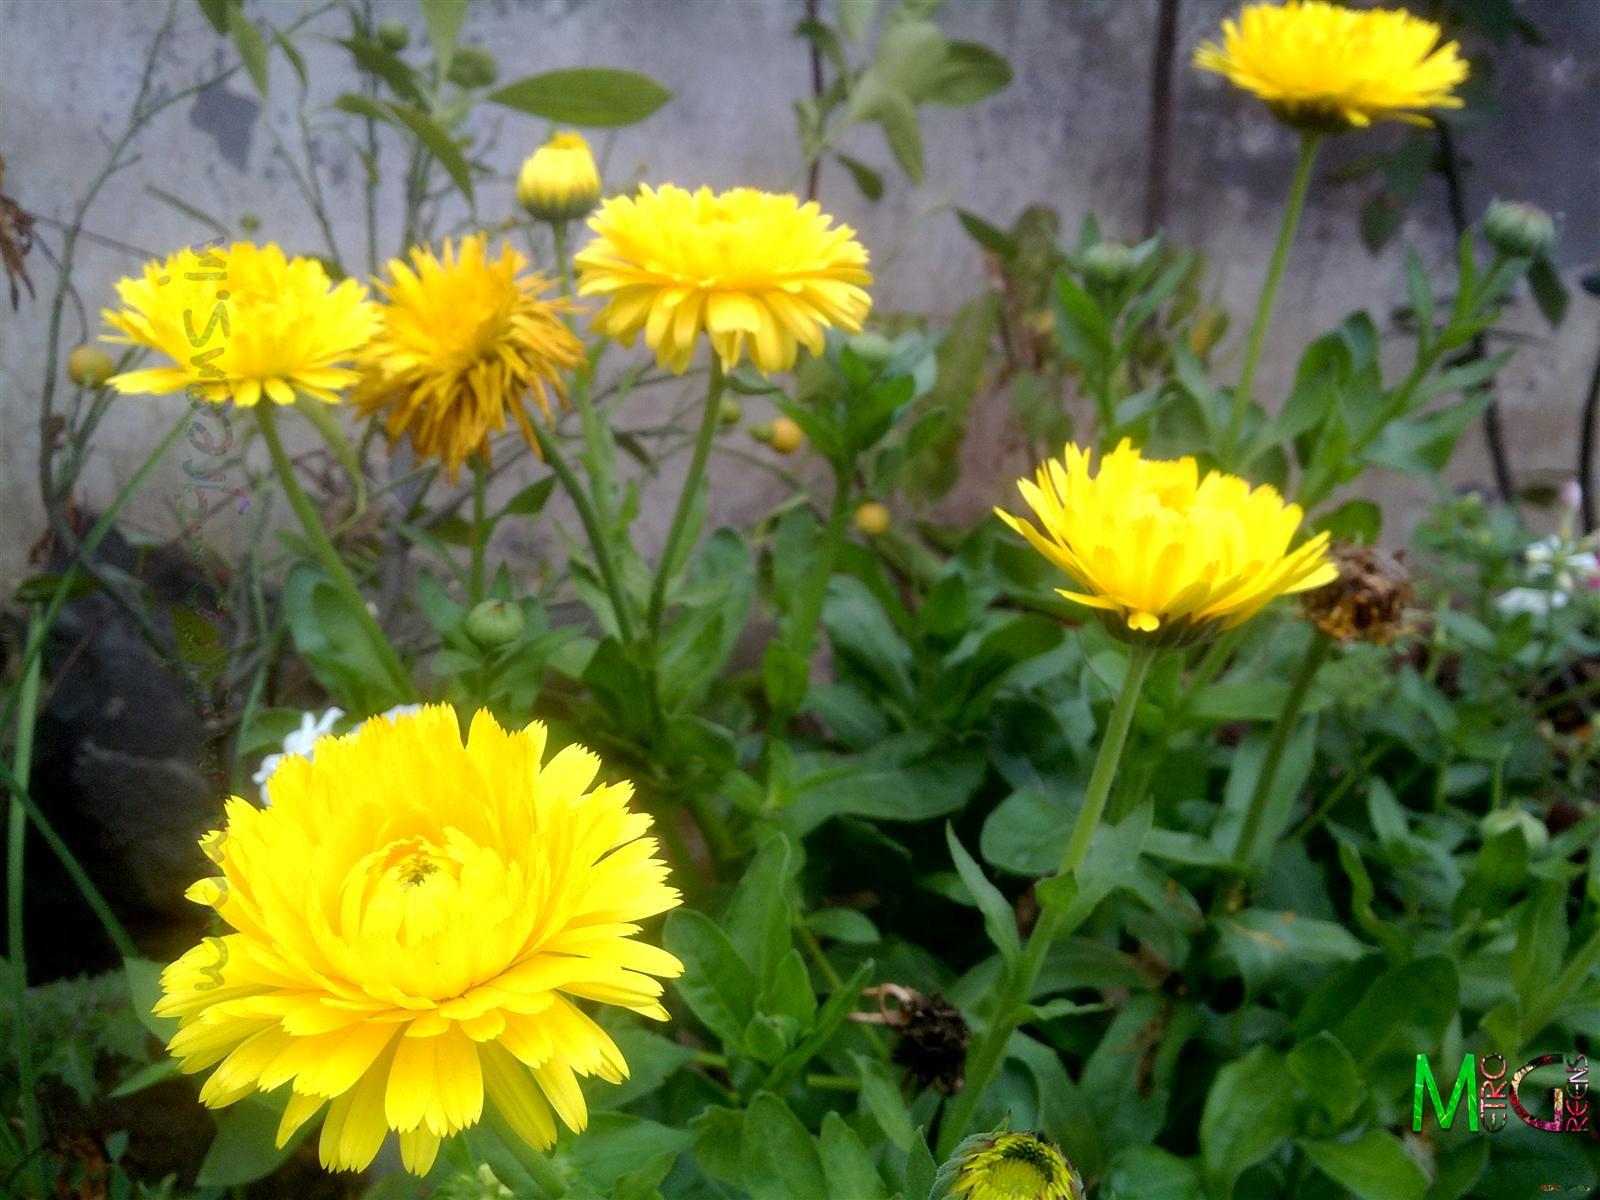 Metro Greens: Yellow Calendula